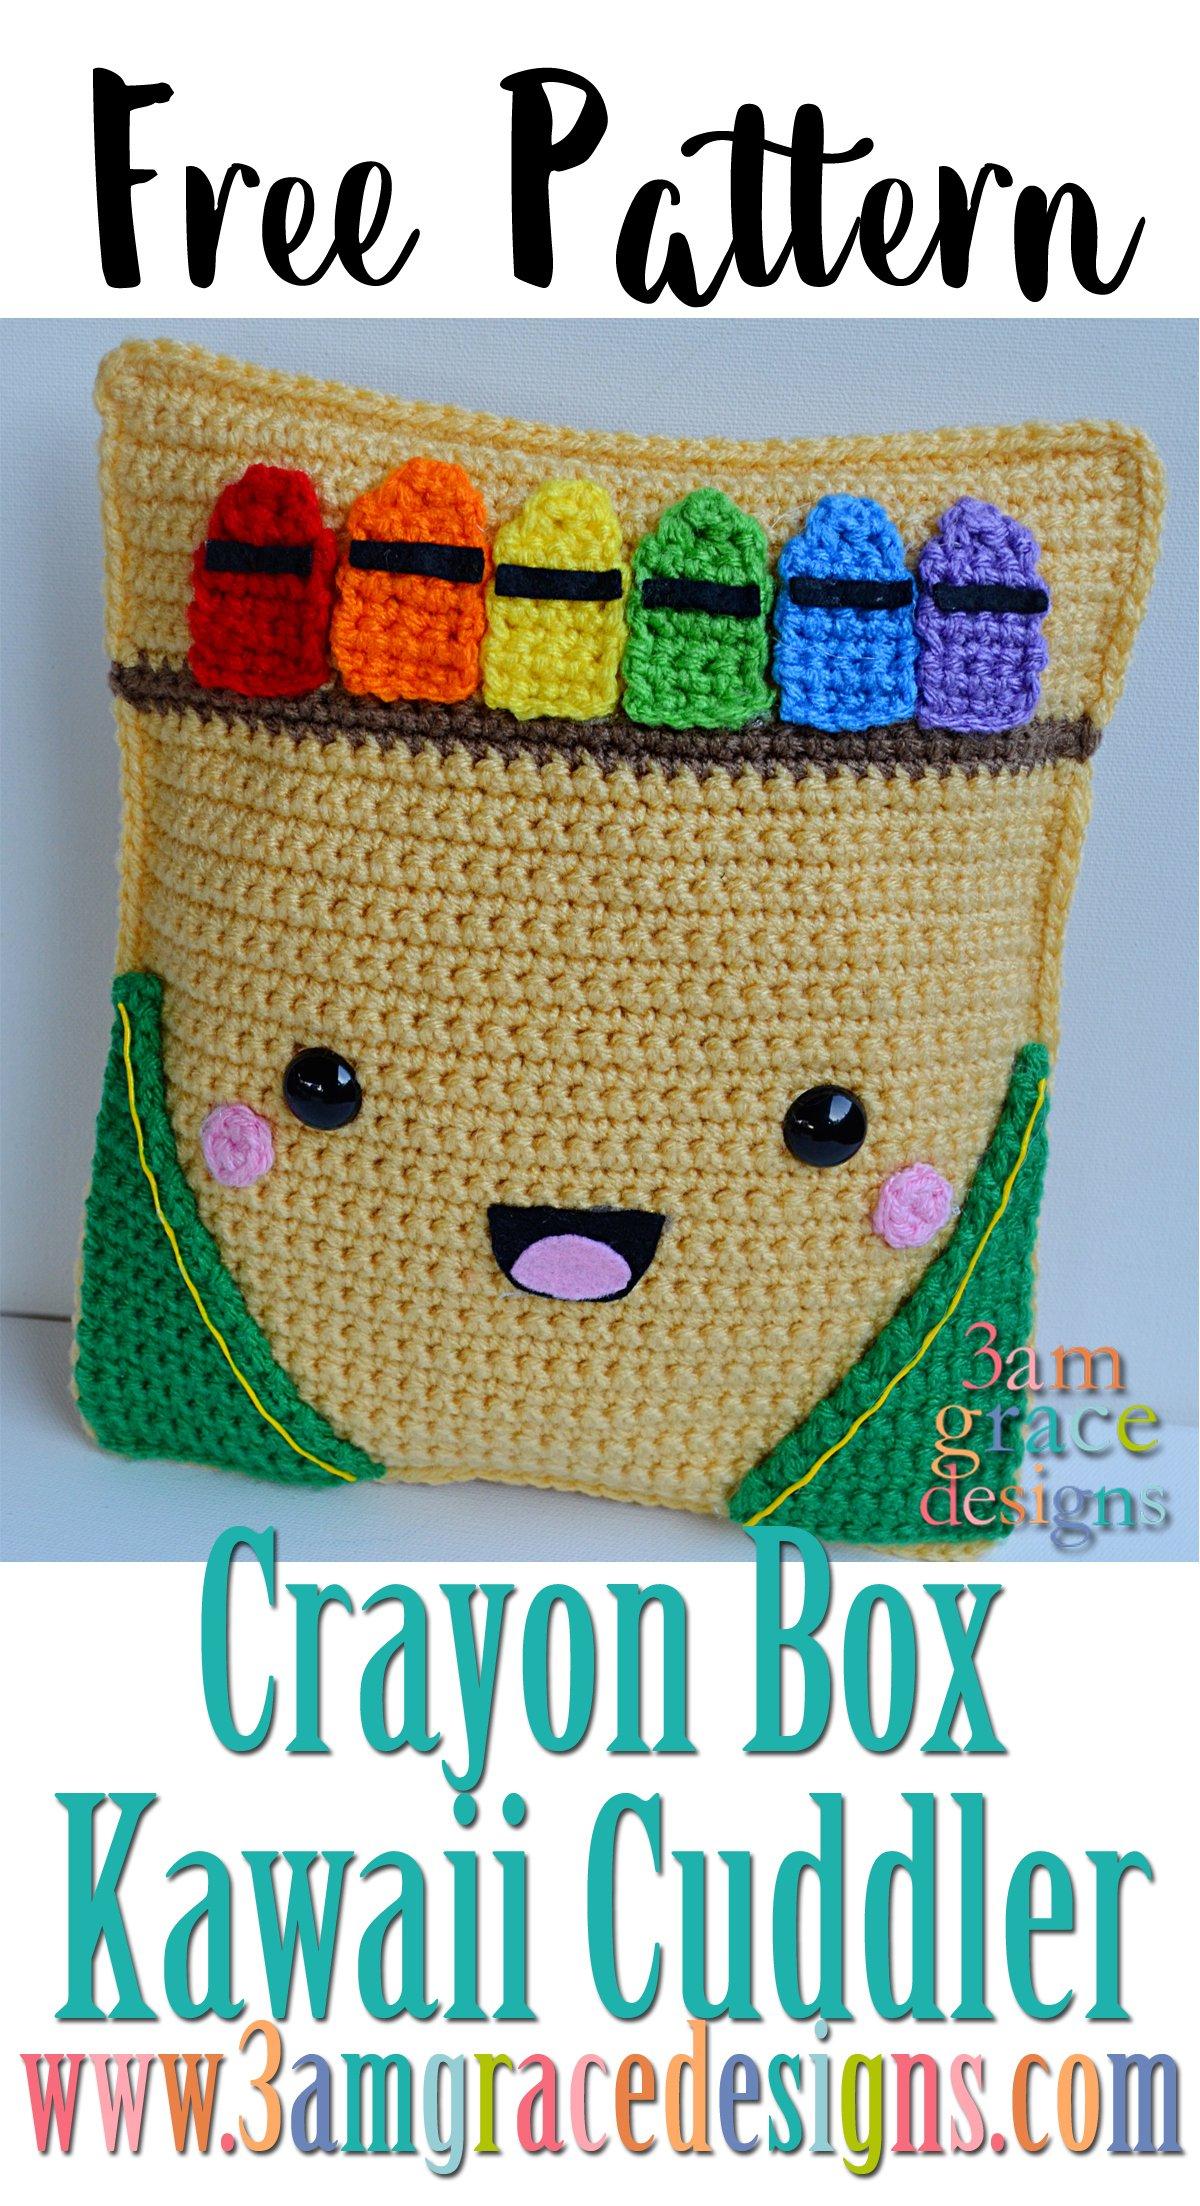 Crayon Box Kawaii Cuddler™   3amgracedesigns